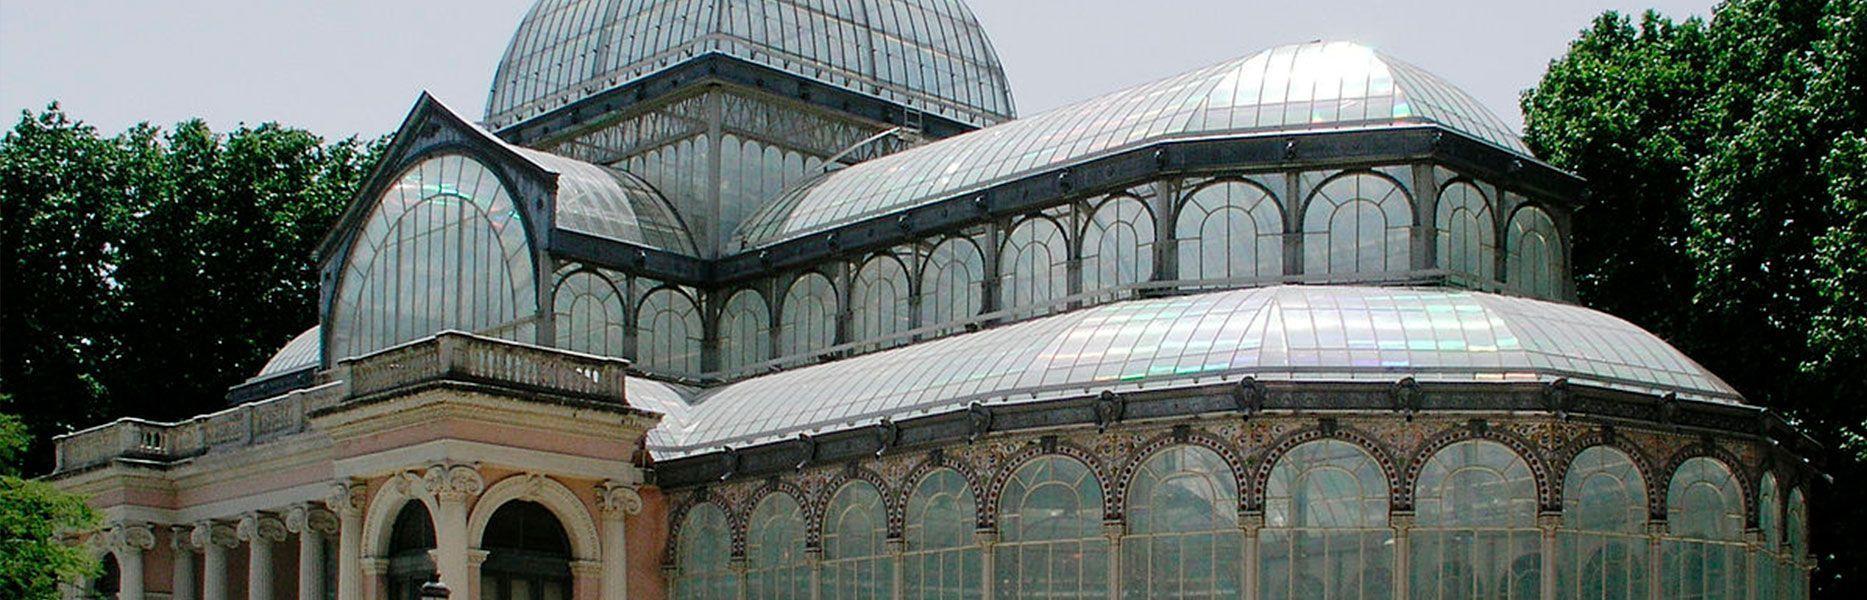 palacio-cristal-madrid